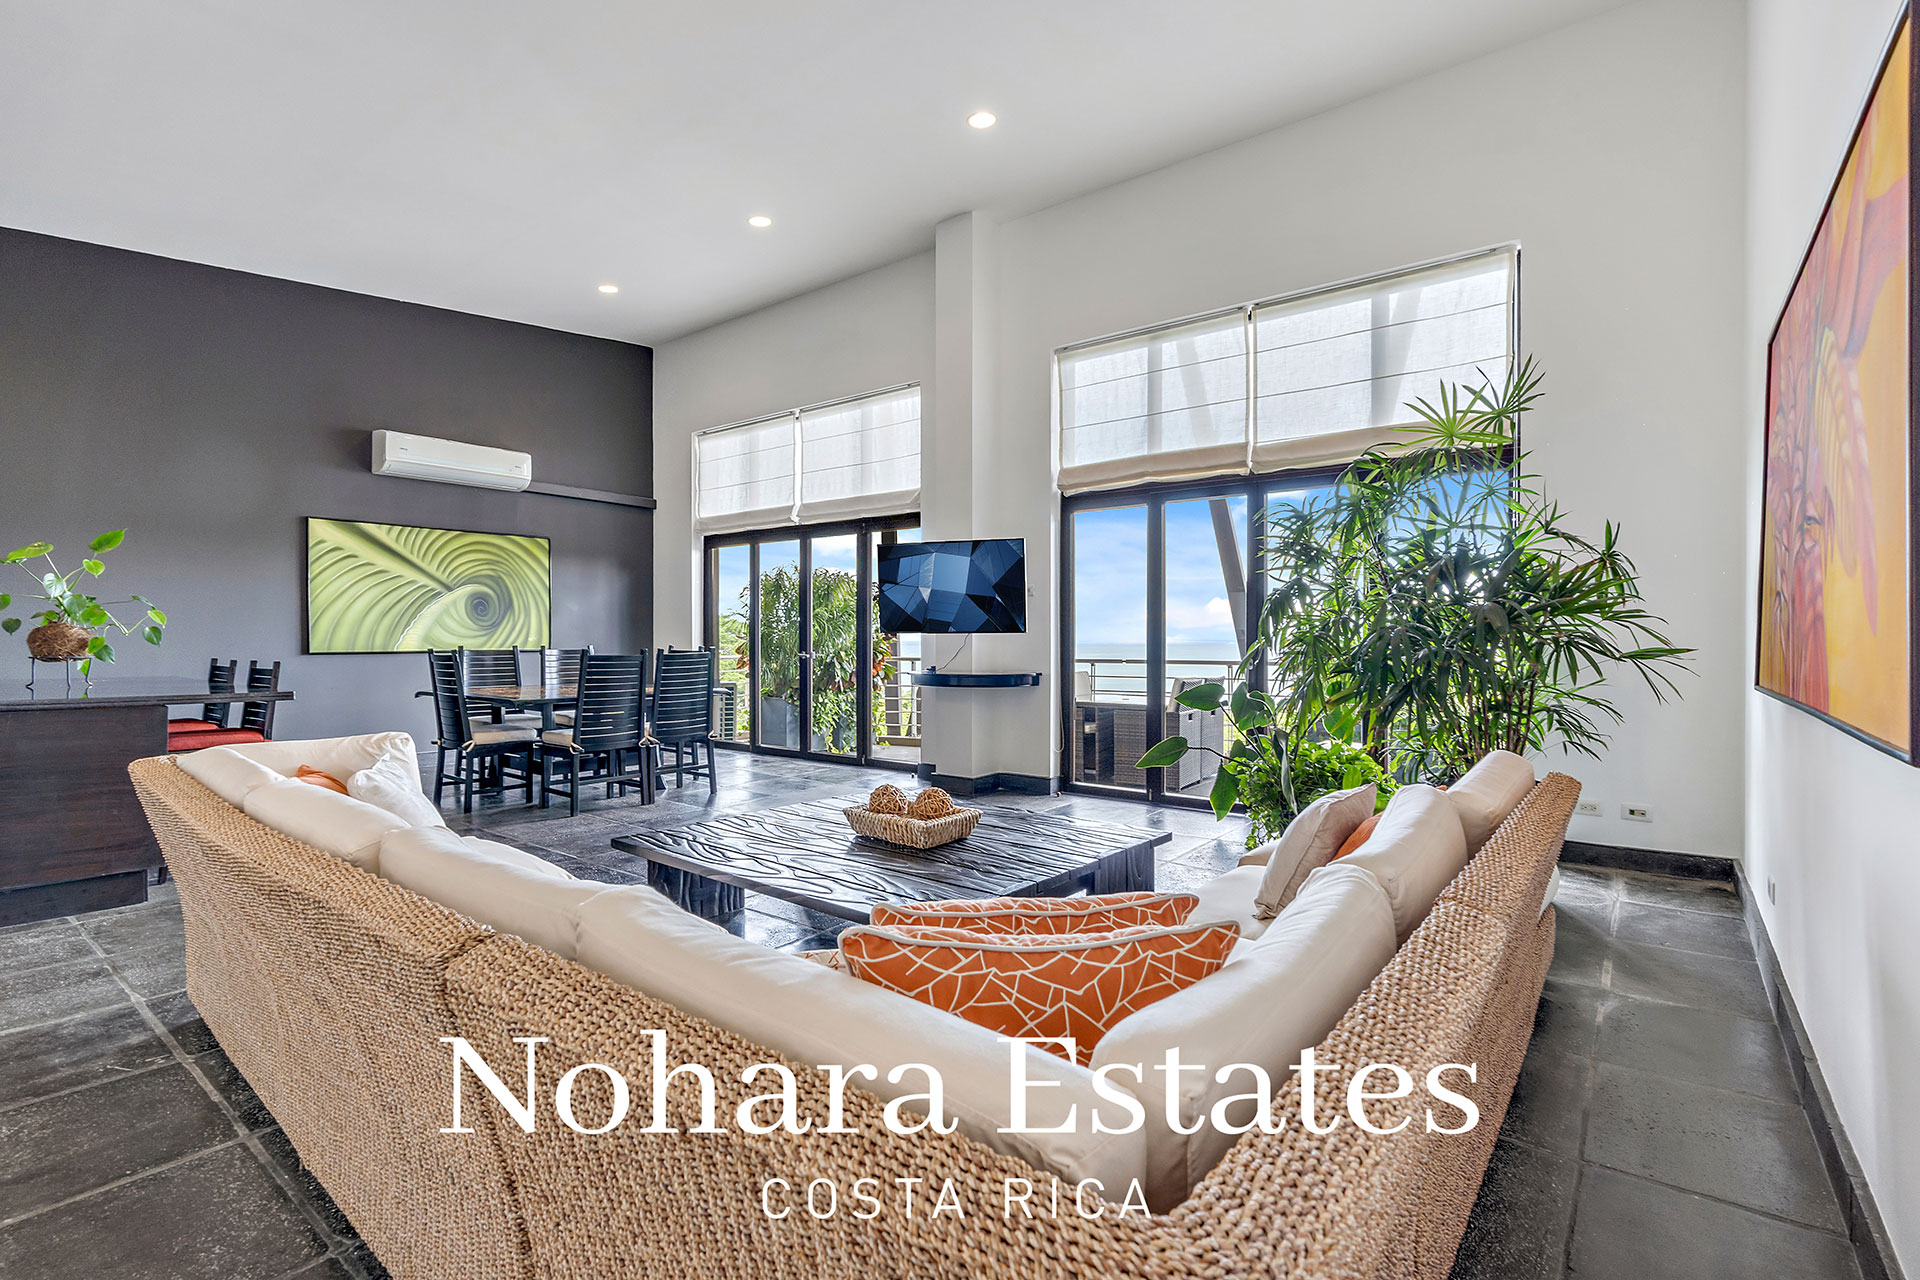 Nohara Estates Costa Rica 128 Penthouse Quepos Los Altos 20